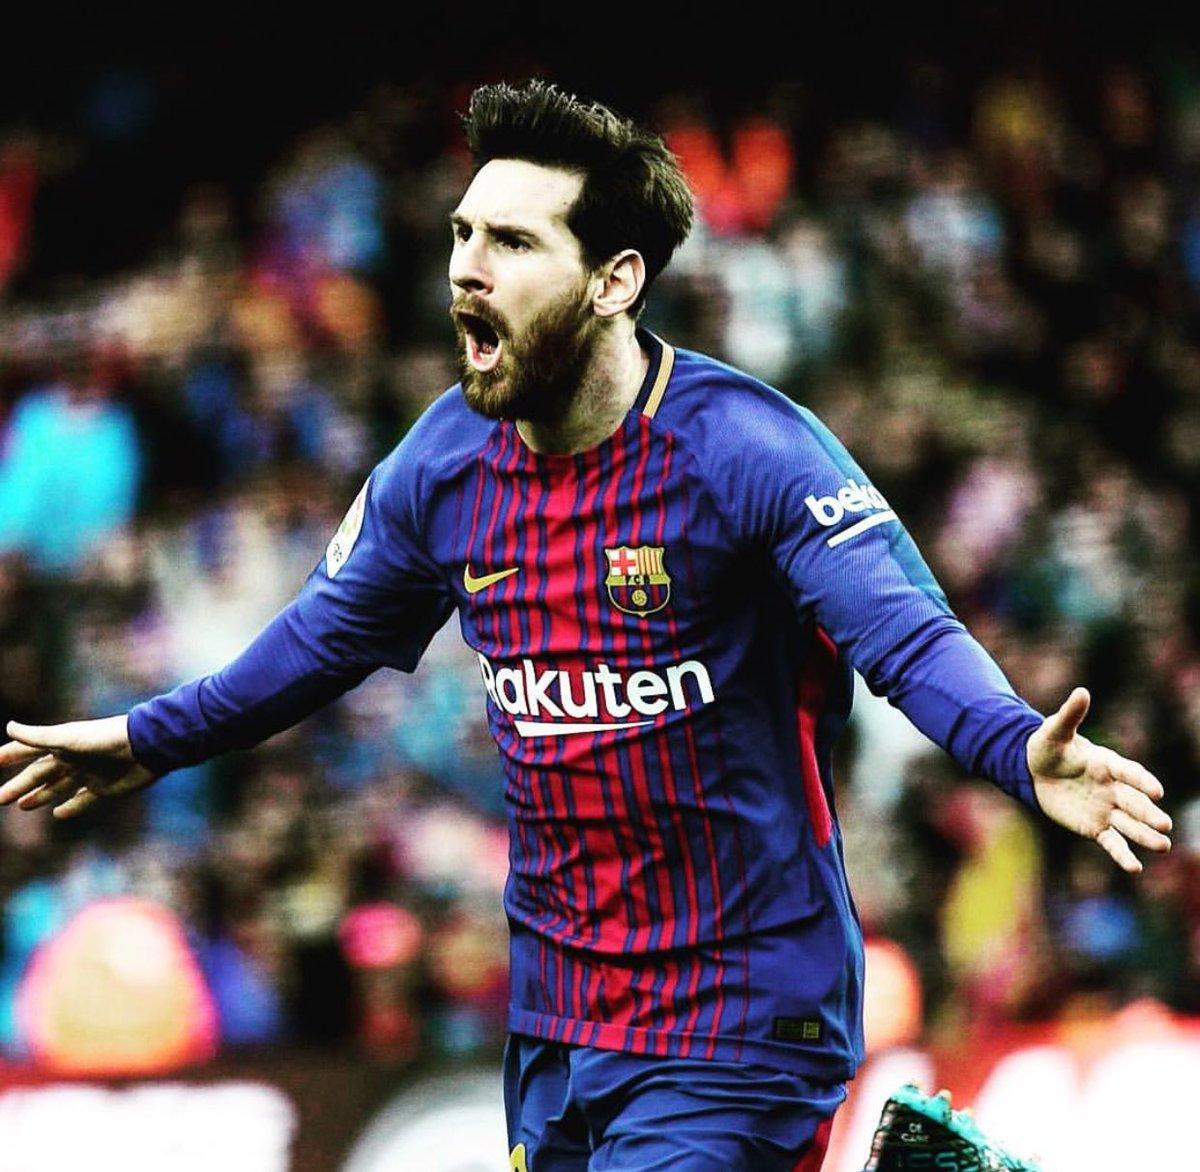 ¿Es Leo Messi Imposible? - Página 37 DXddXVrWAAEJkP5